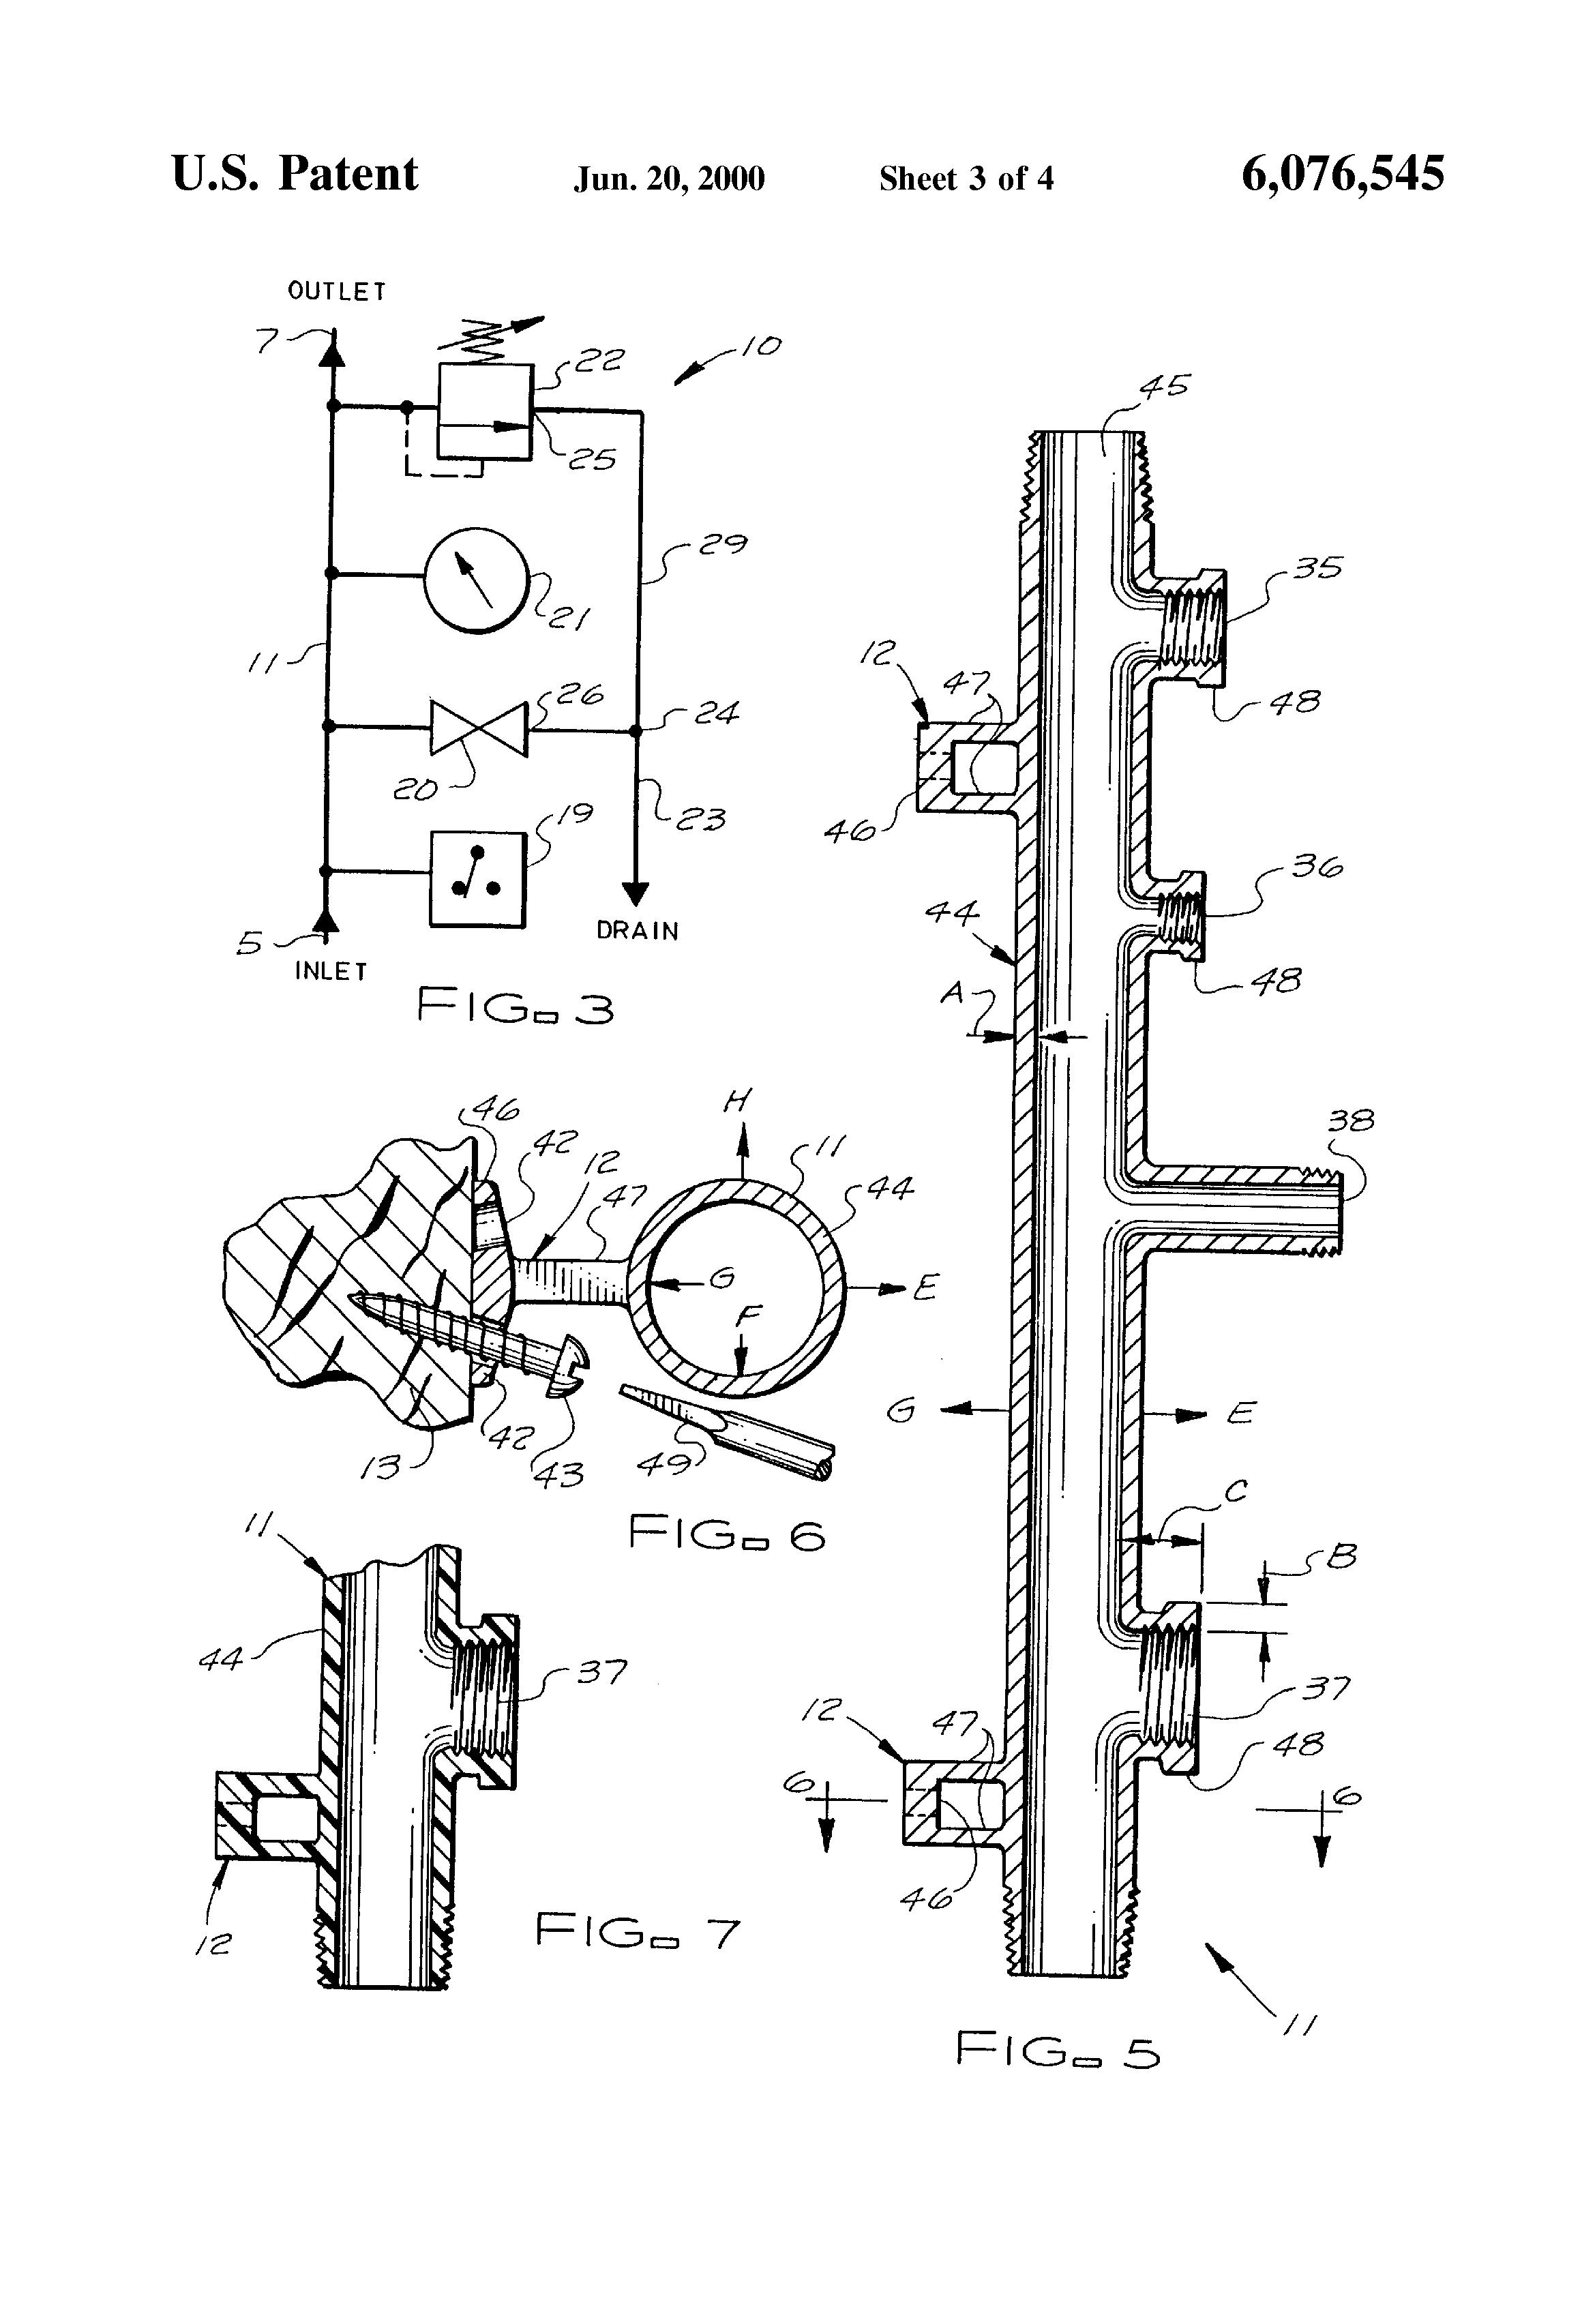 Patent US Fire control sprinkler system riser means